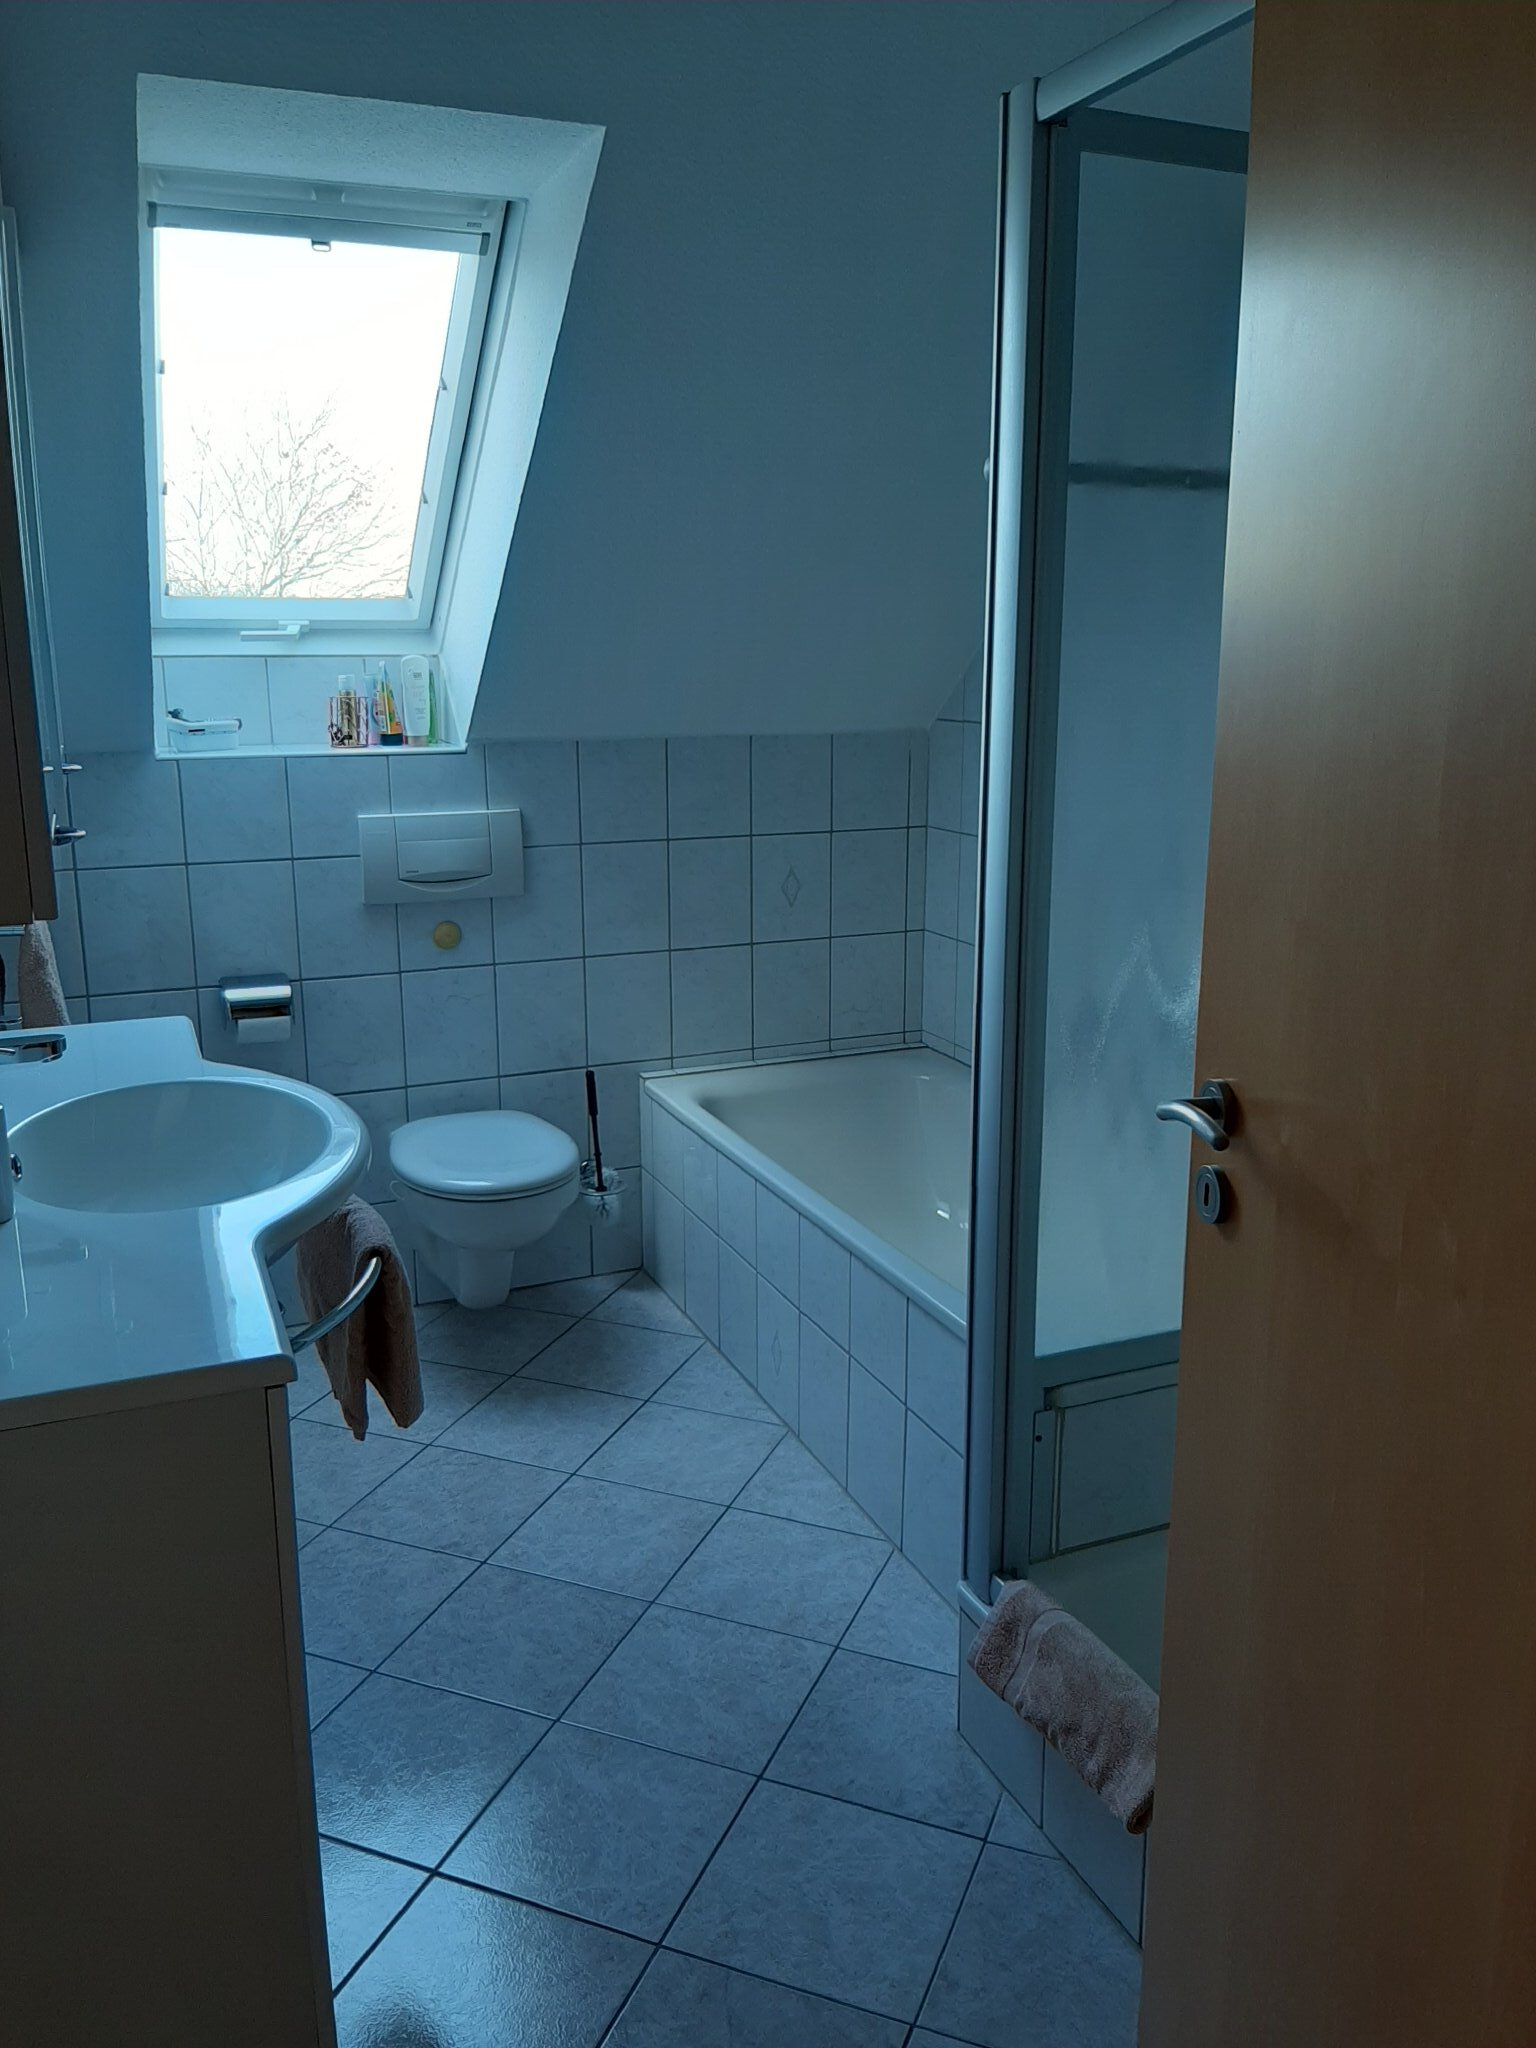 Duschkabine, Badewanne, WC usw.